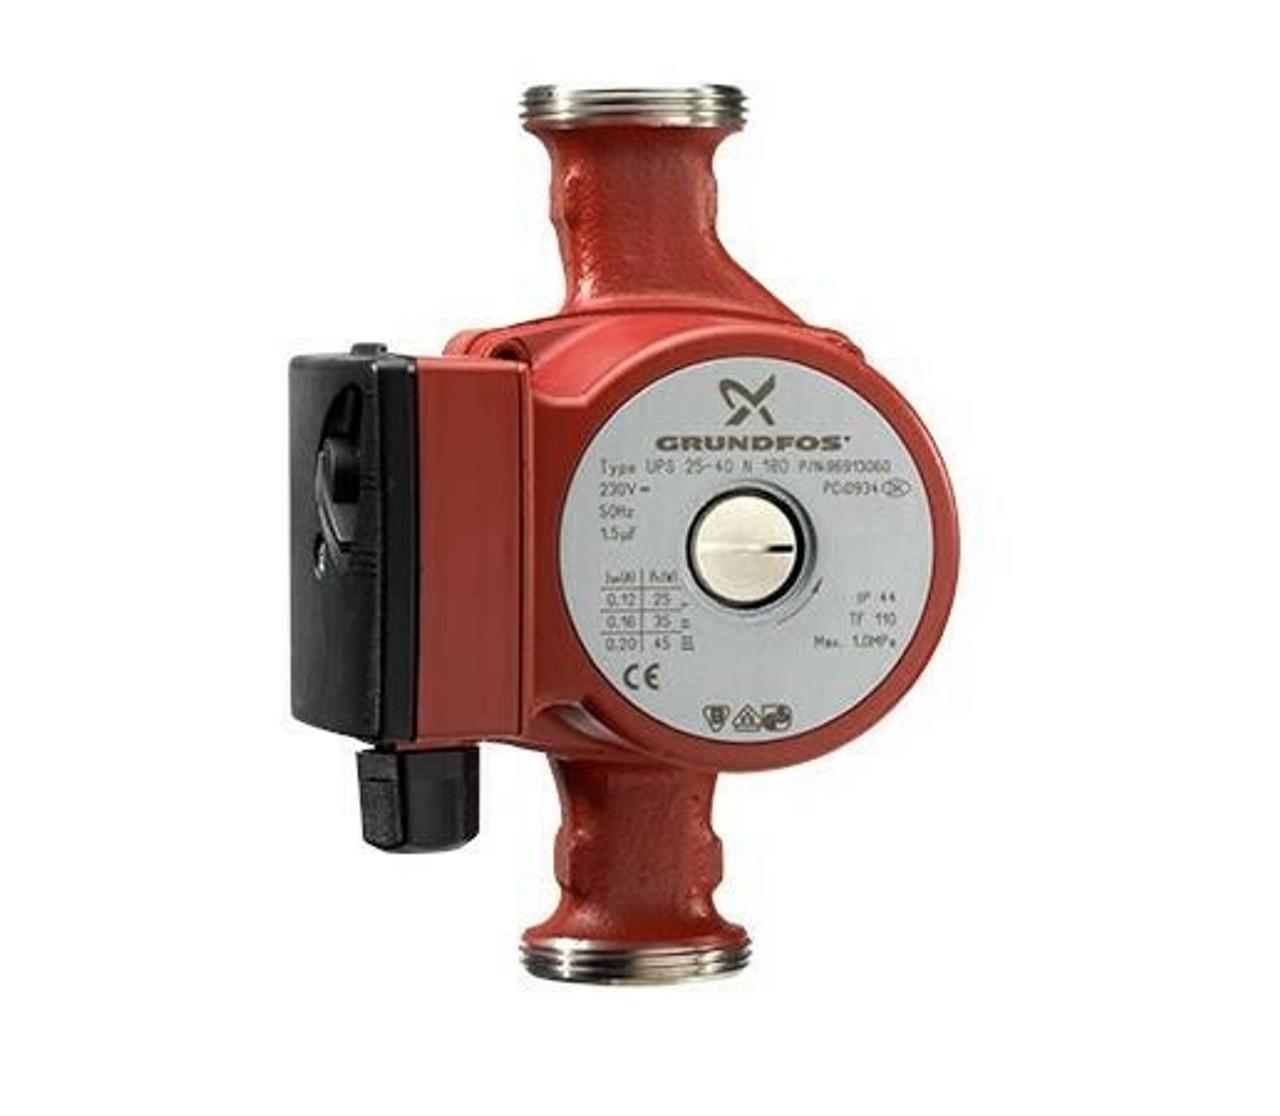 Grundfos UPS 25-60 N 180 circulator pump